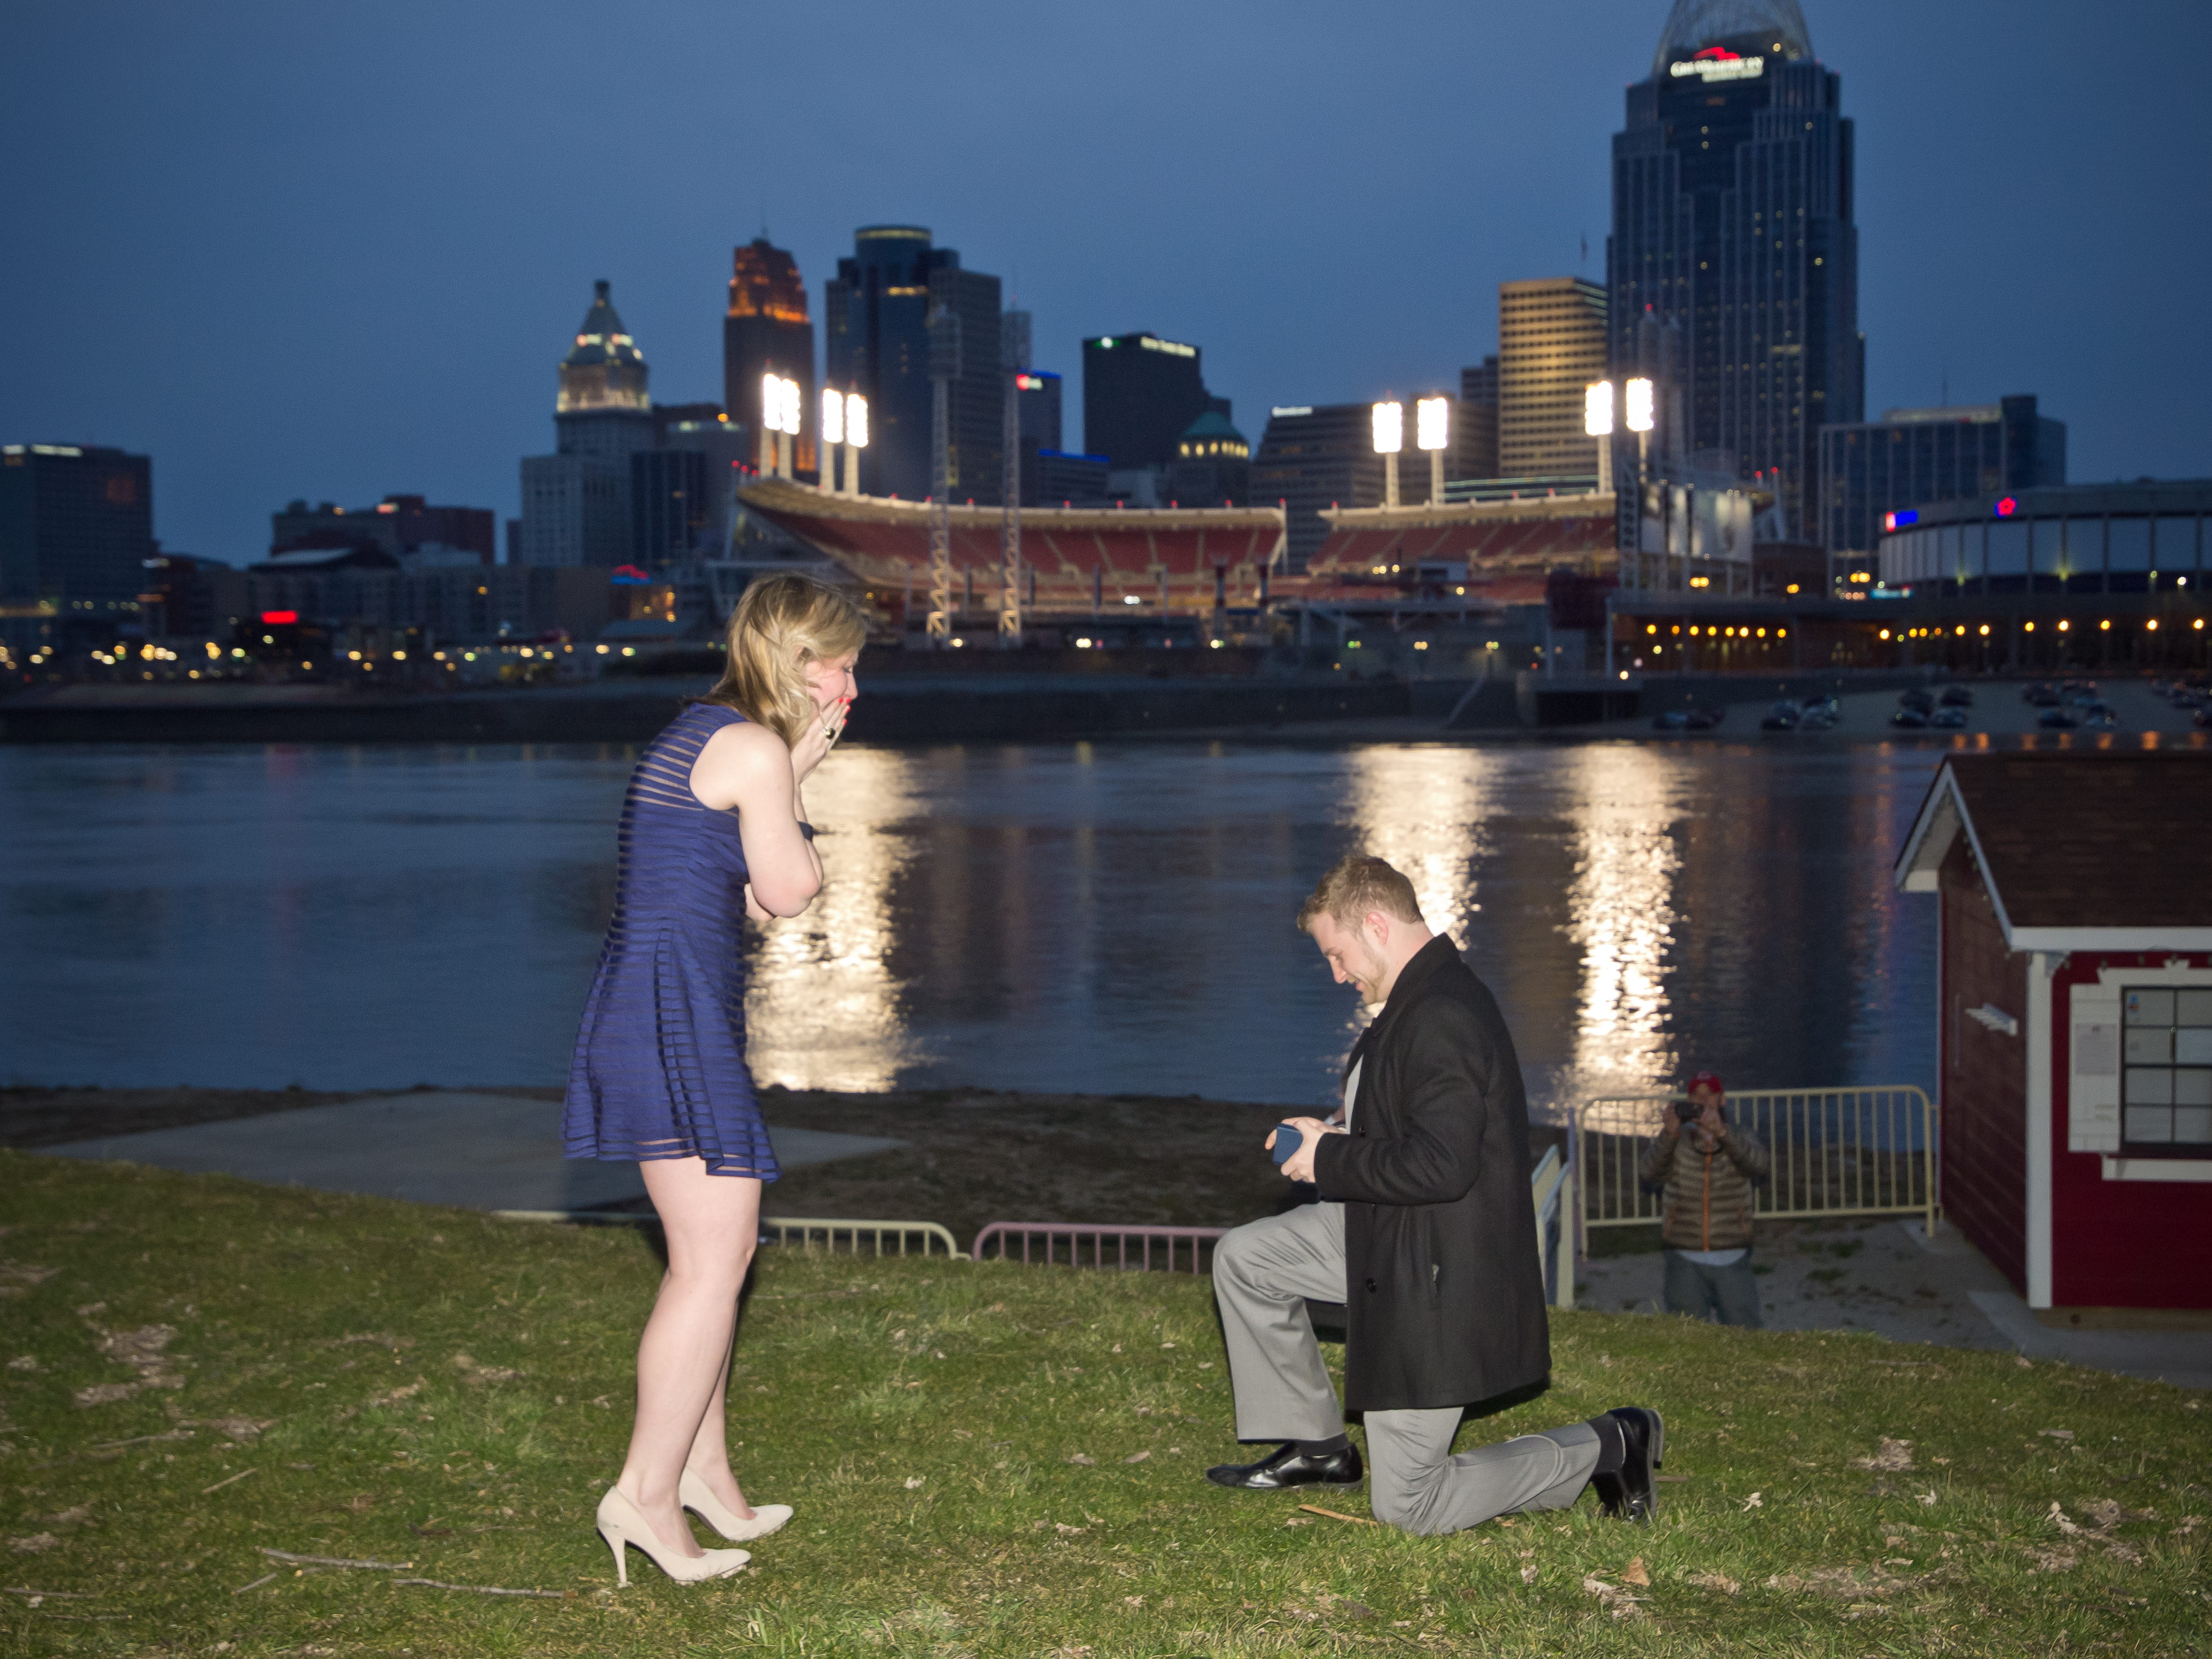 Image 5 of A Very Creative Marriage Proposal in Cincinnati